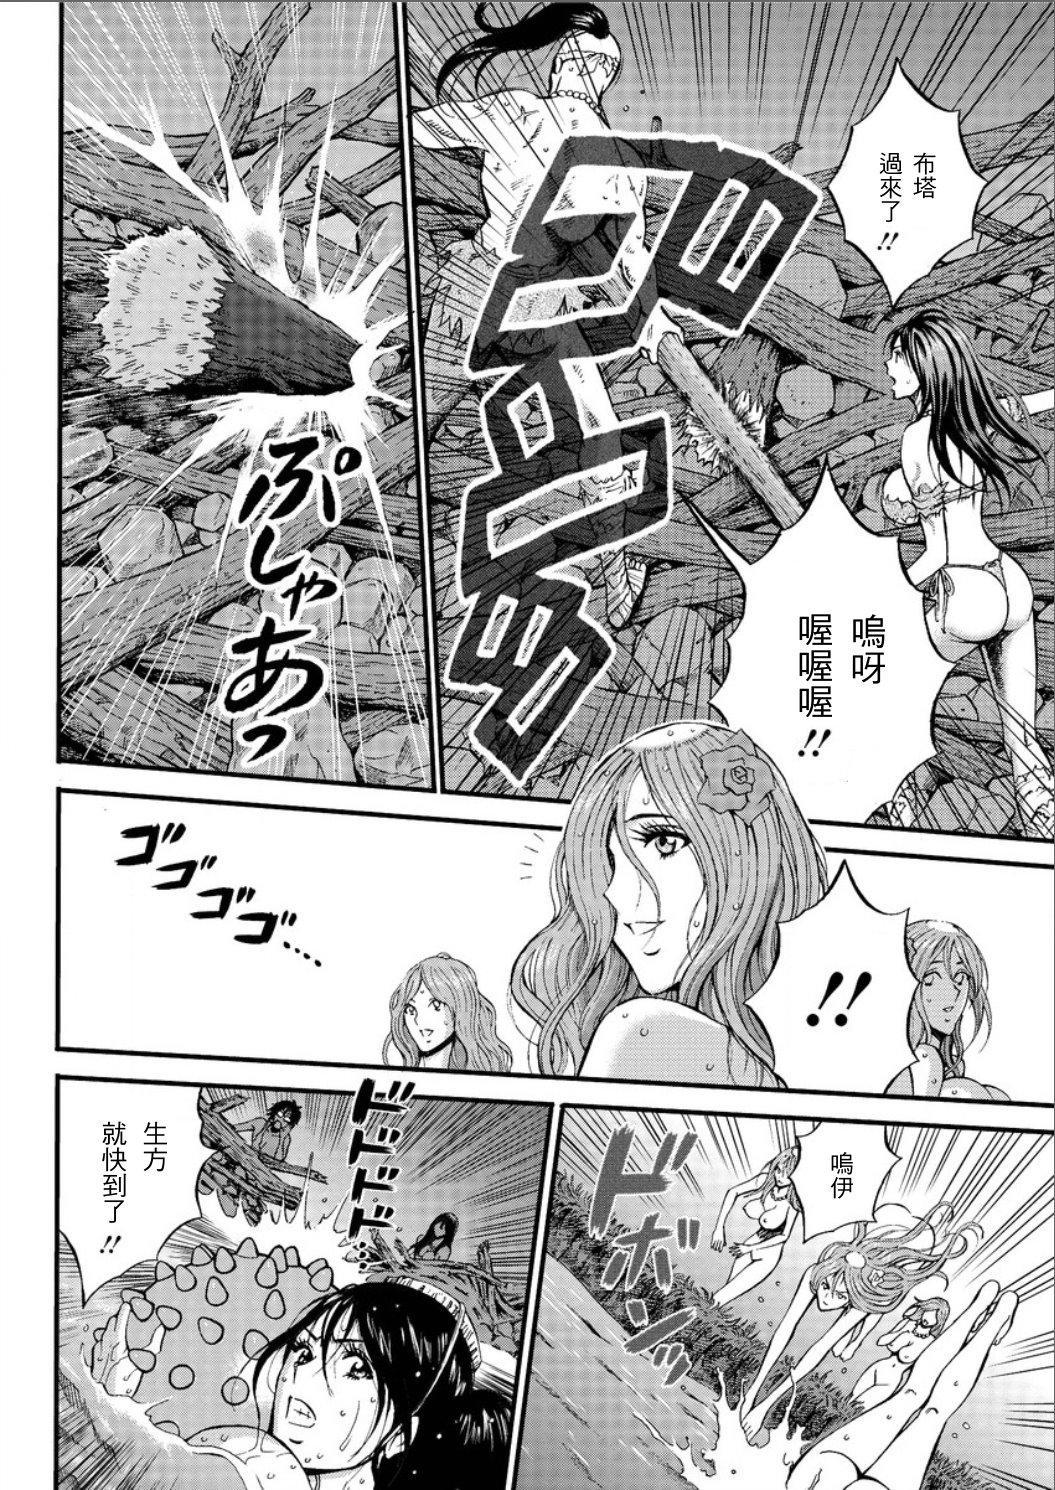 Kigenzen 10000 Nen no Ota | 史前一萬年的宅男 Ch. 19-24 25